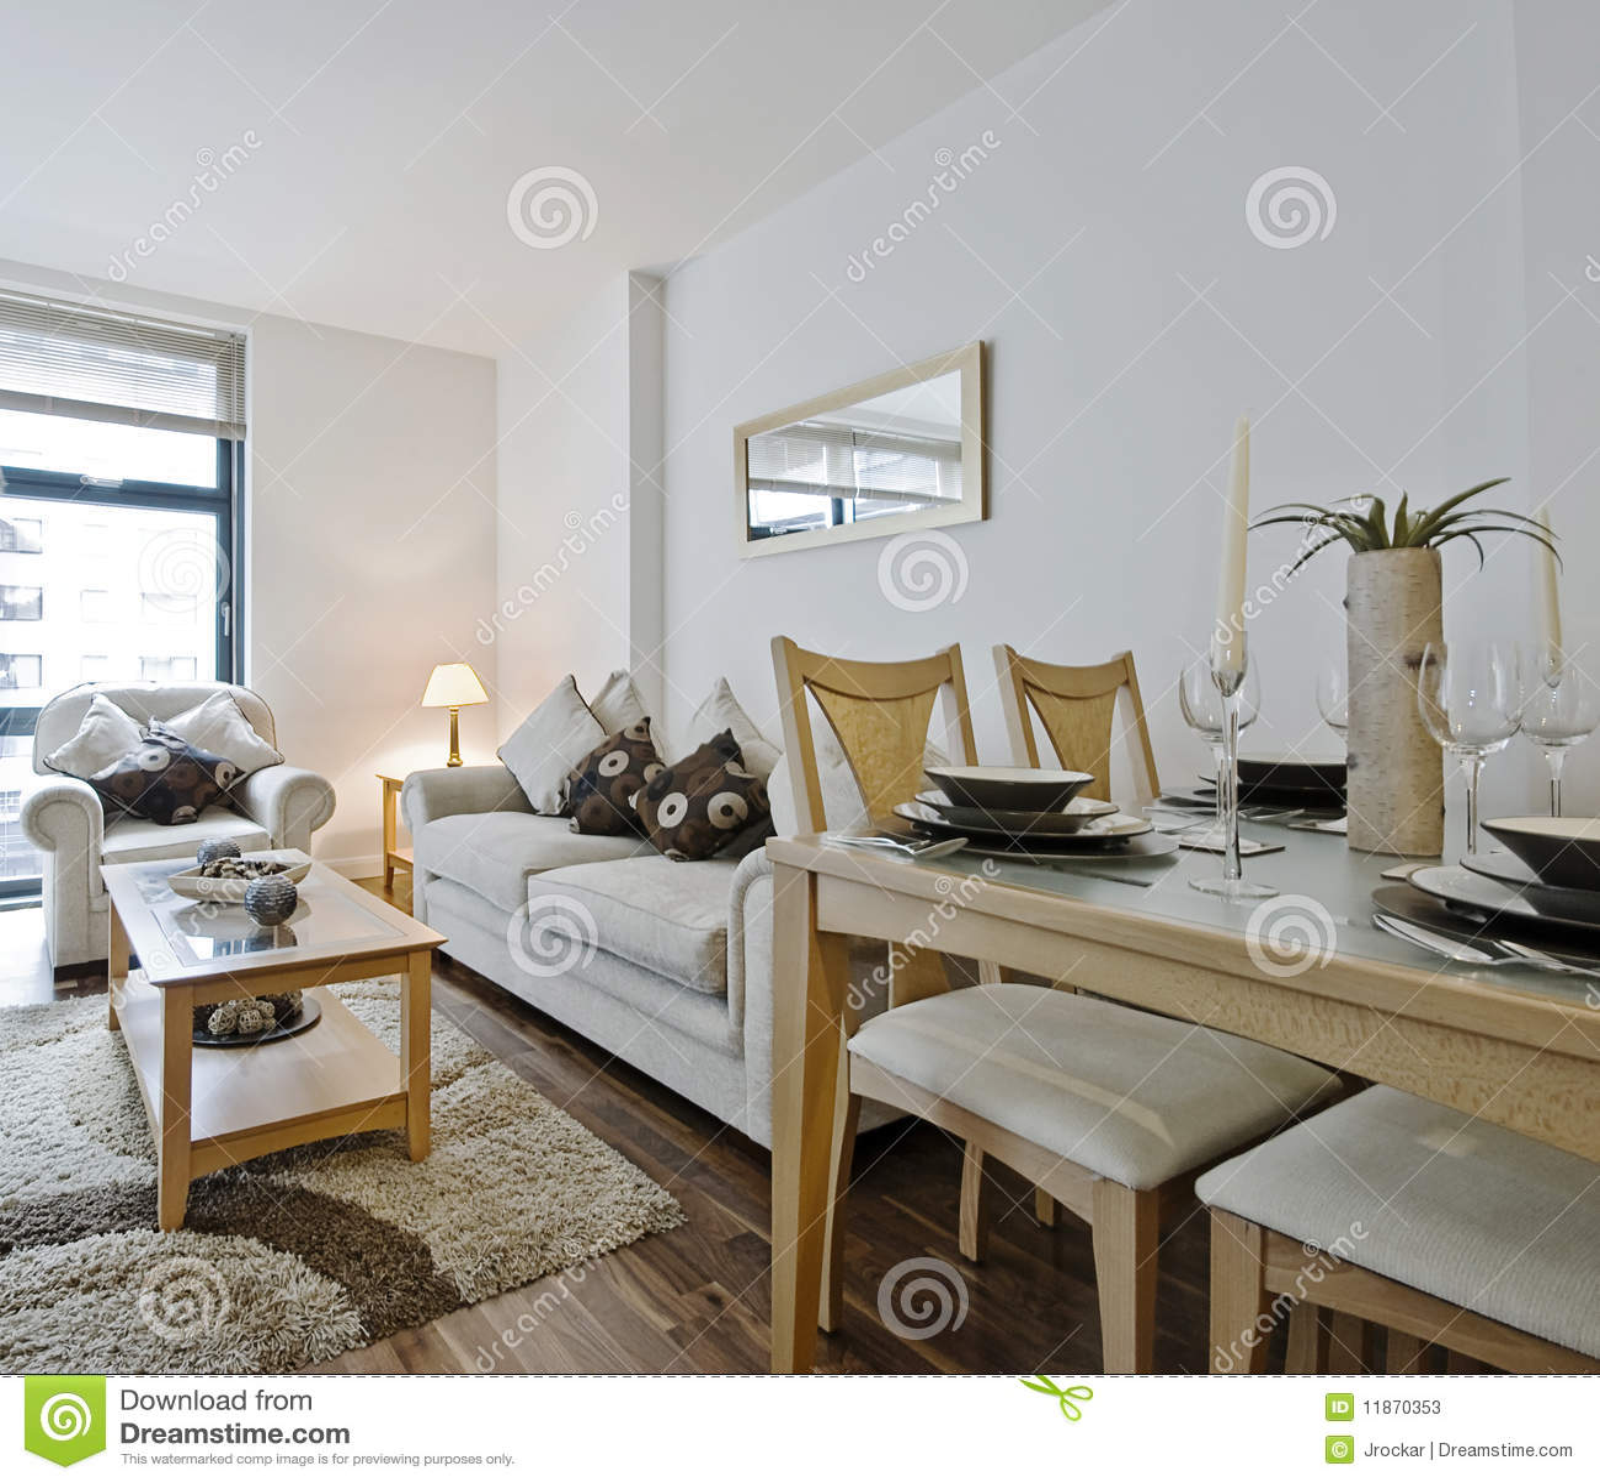 decoratie woonkamer modern ~ lactate for ., Deco ideeën